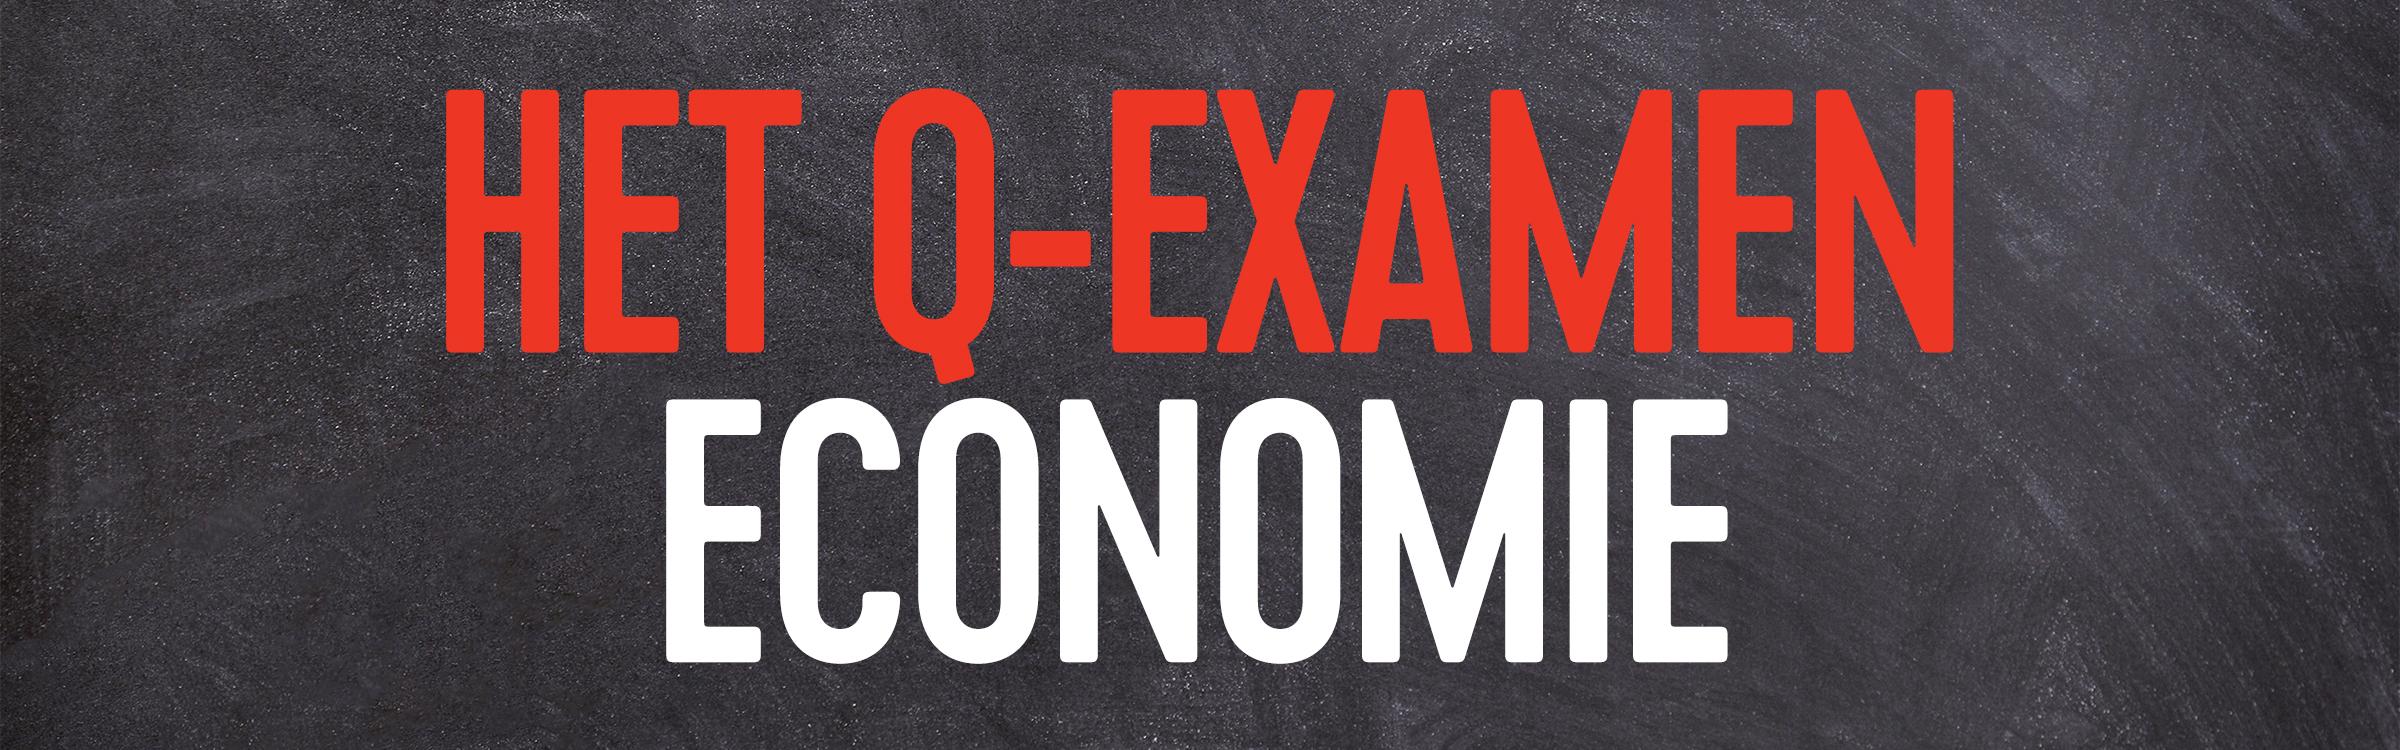 Q examen economie header